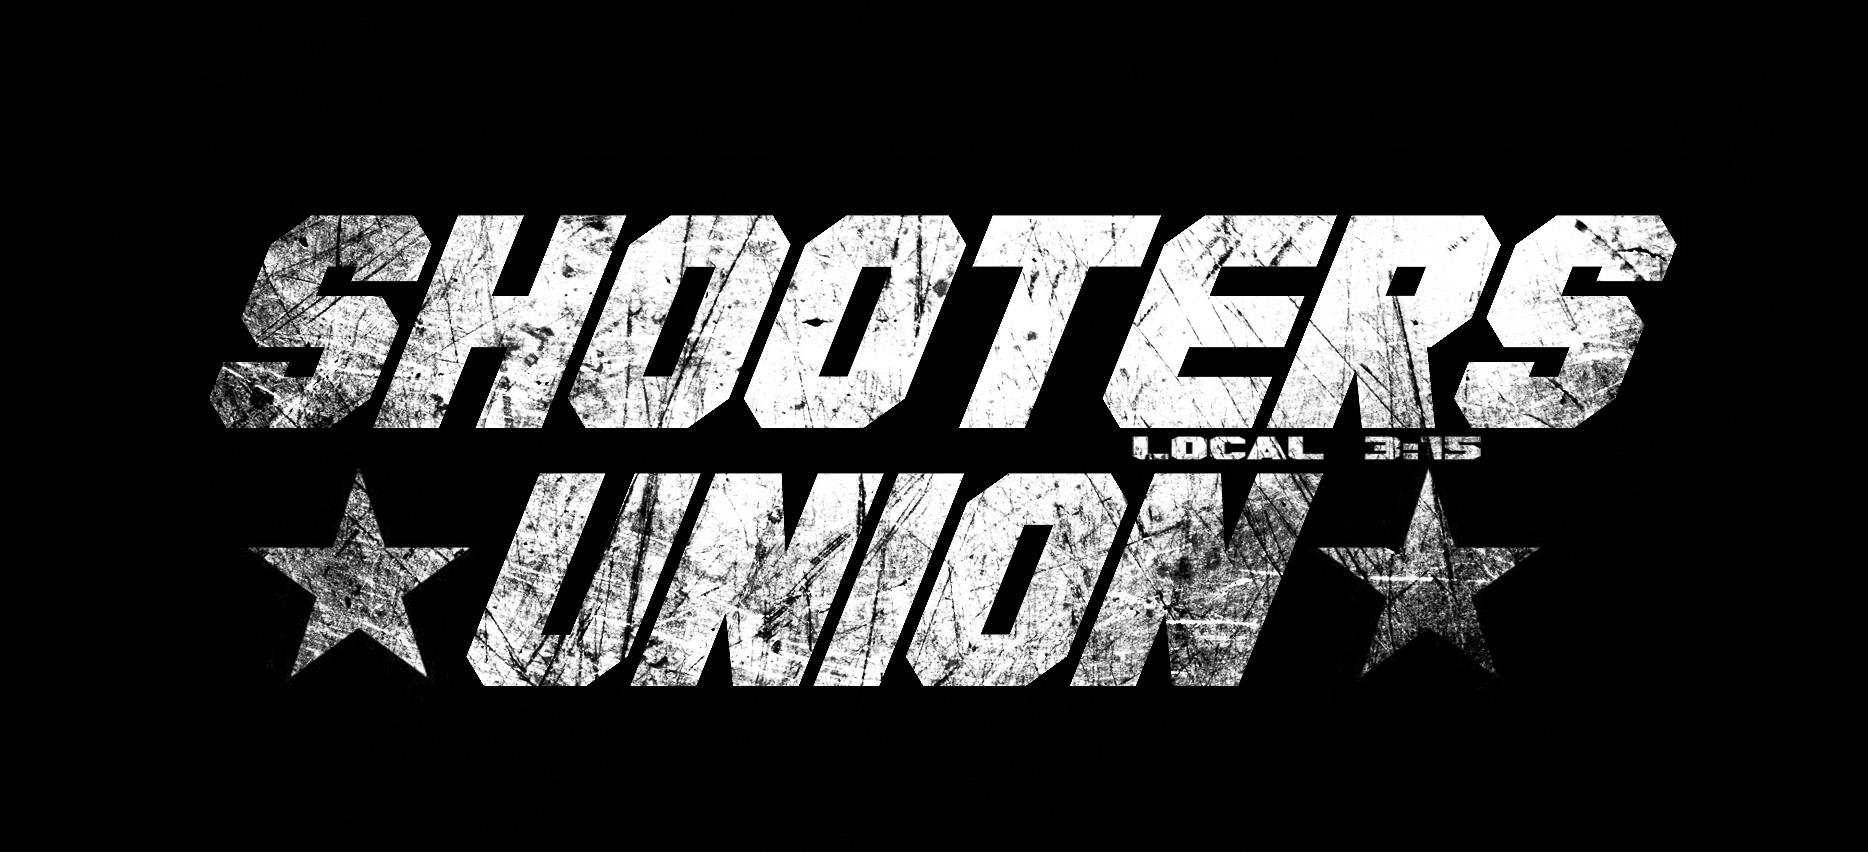 Shooters Union Band Logo